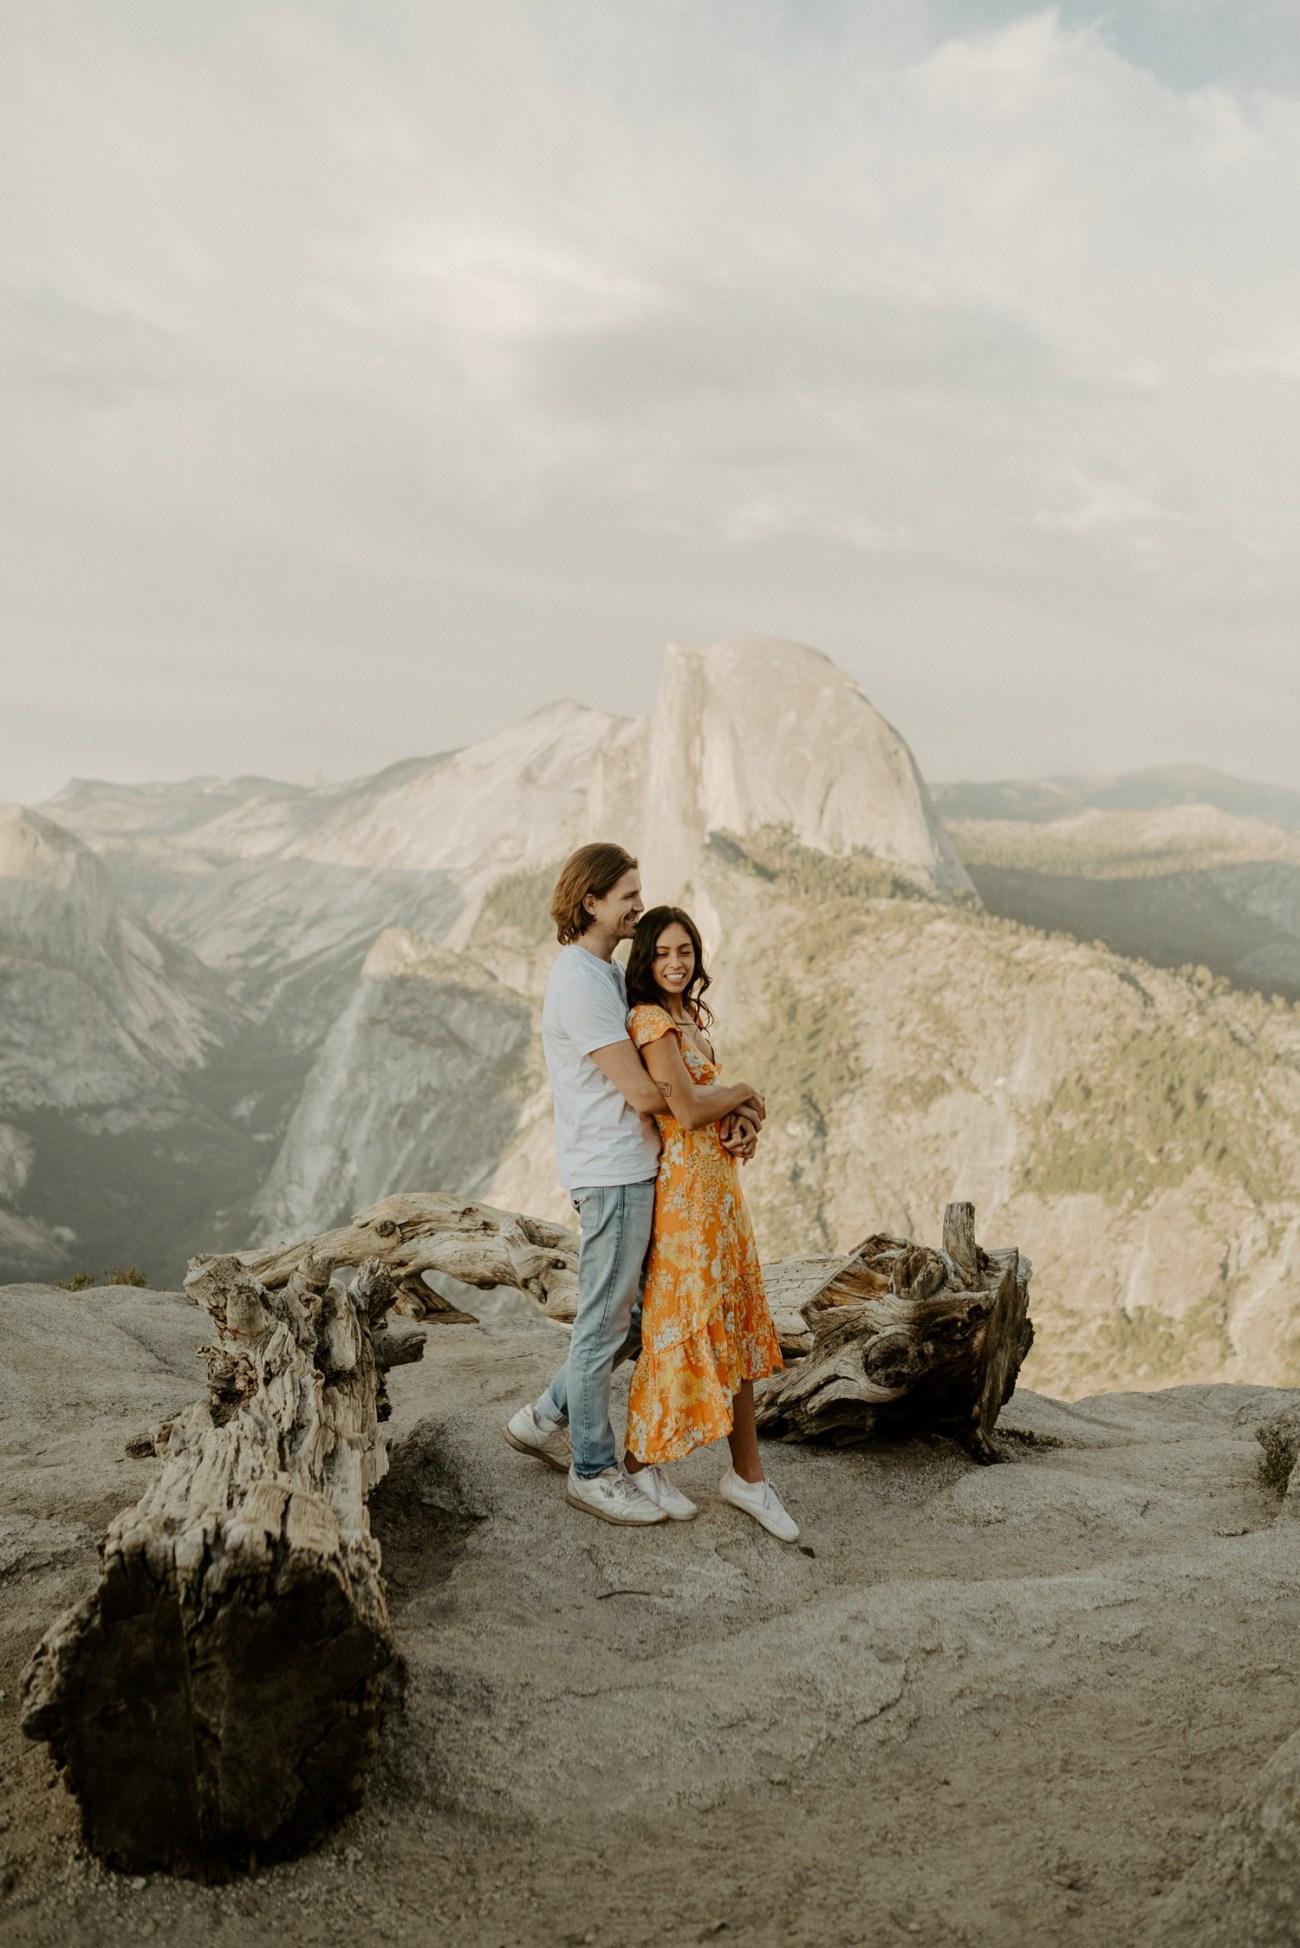 Sunset Yosemite Glacier Point Engagement Session Anais Possamai Photography 17